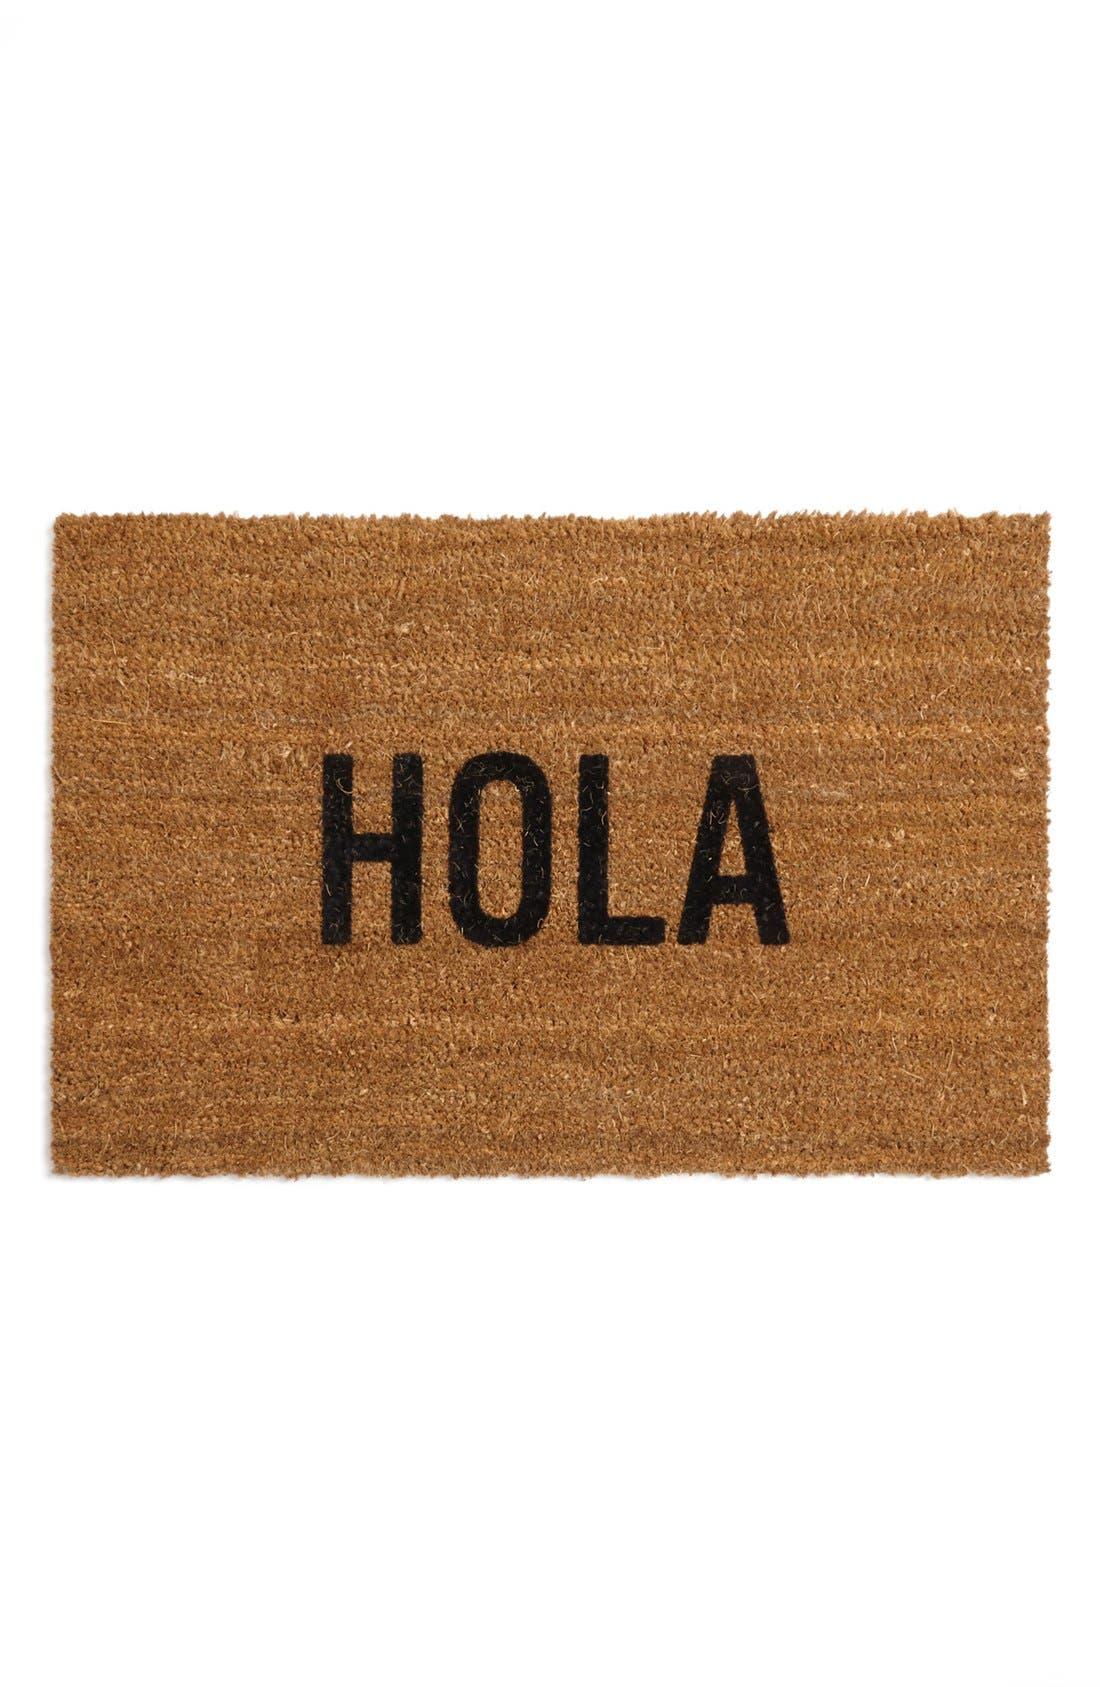 Main Image - Reed Wilson Design 'Hola' Doormat